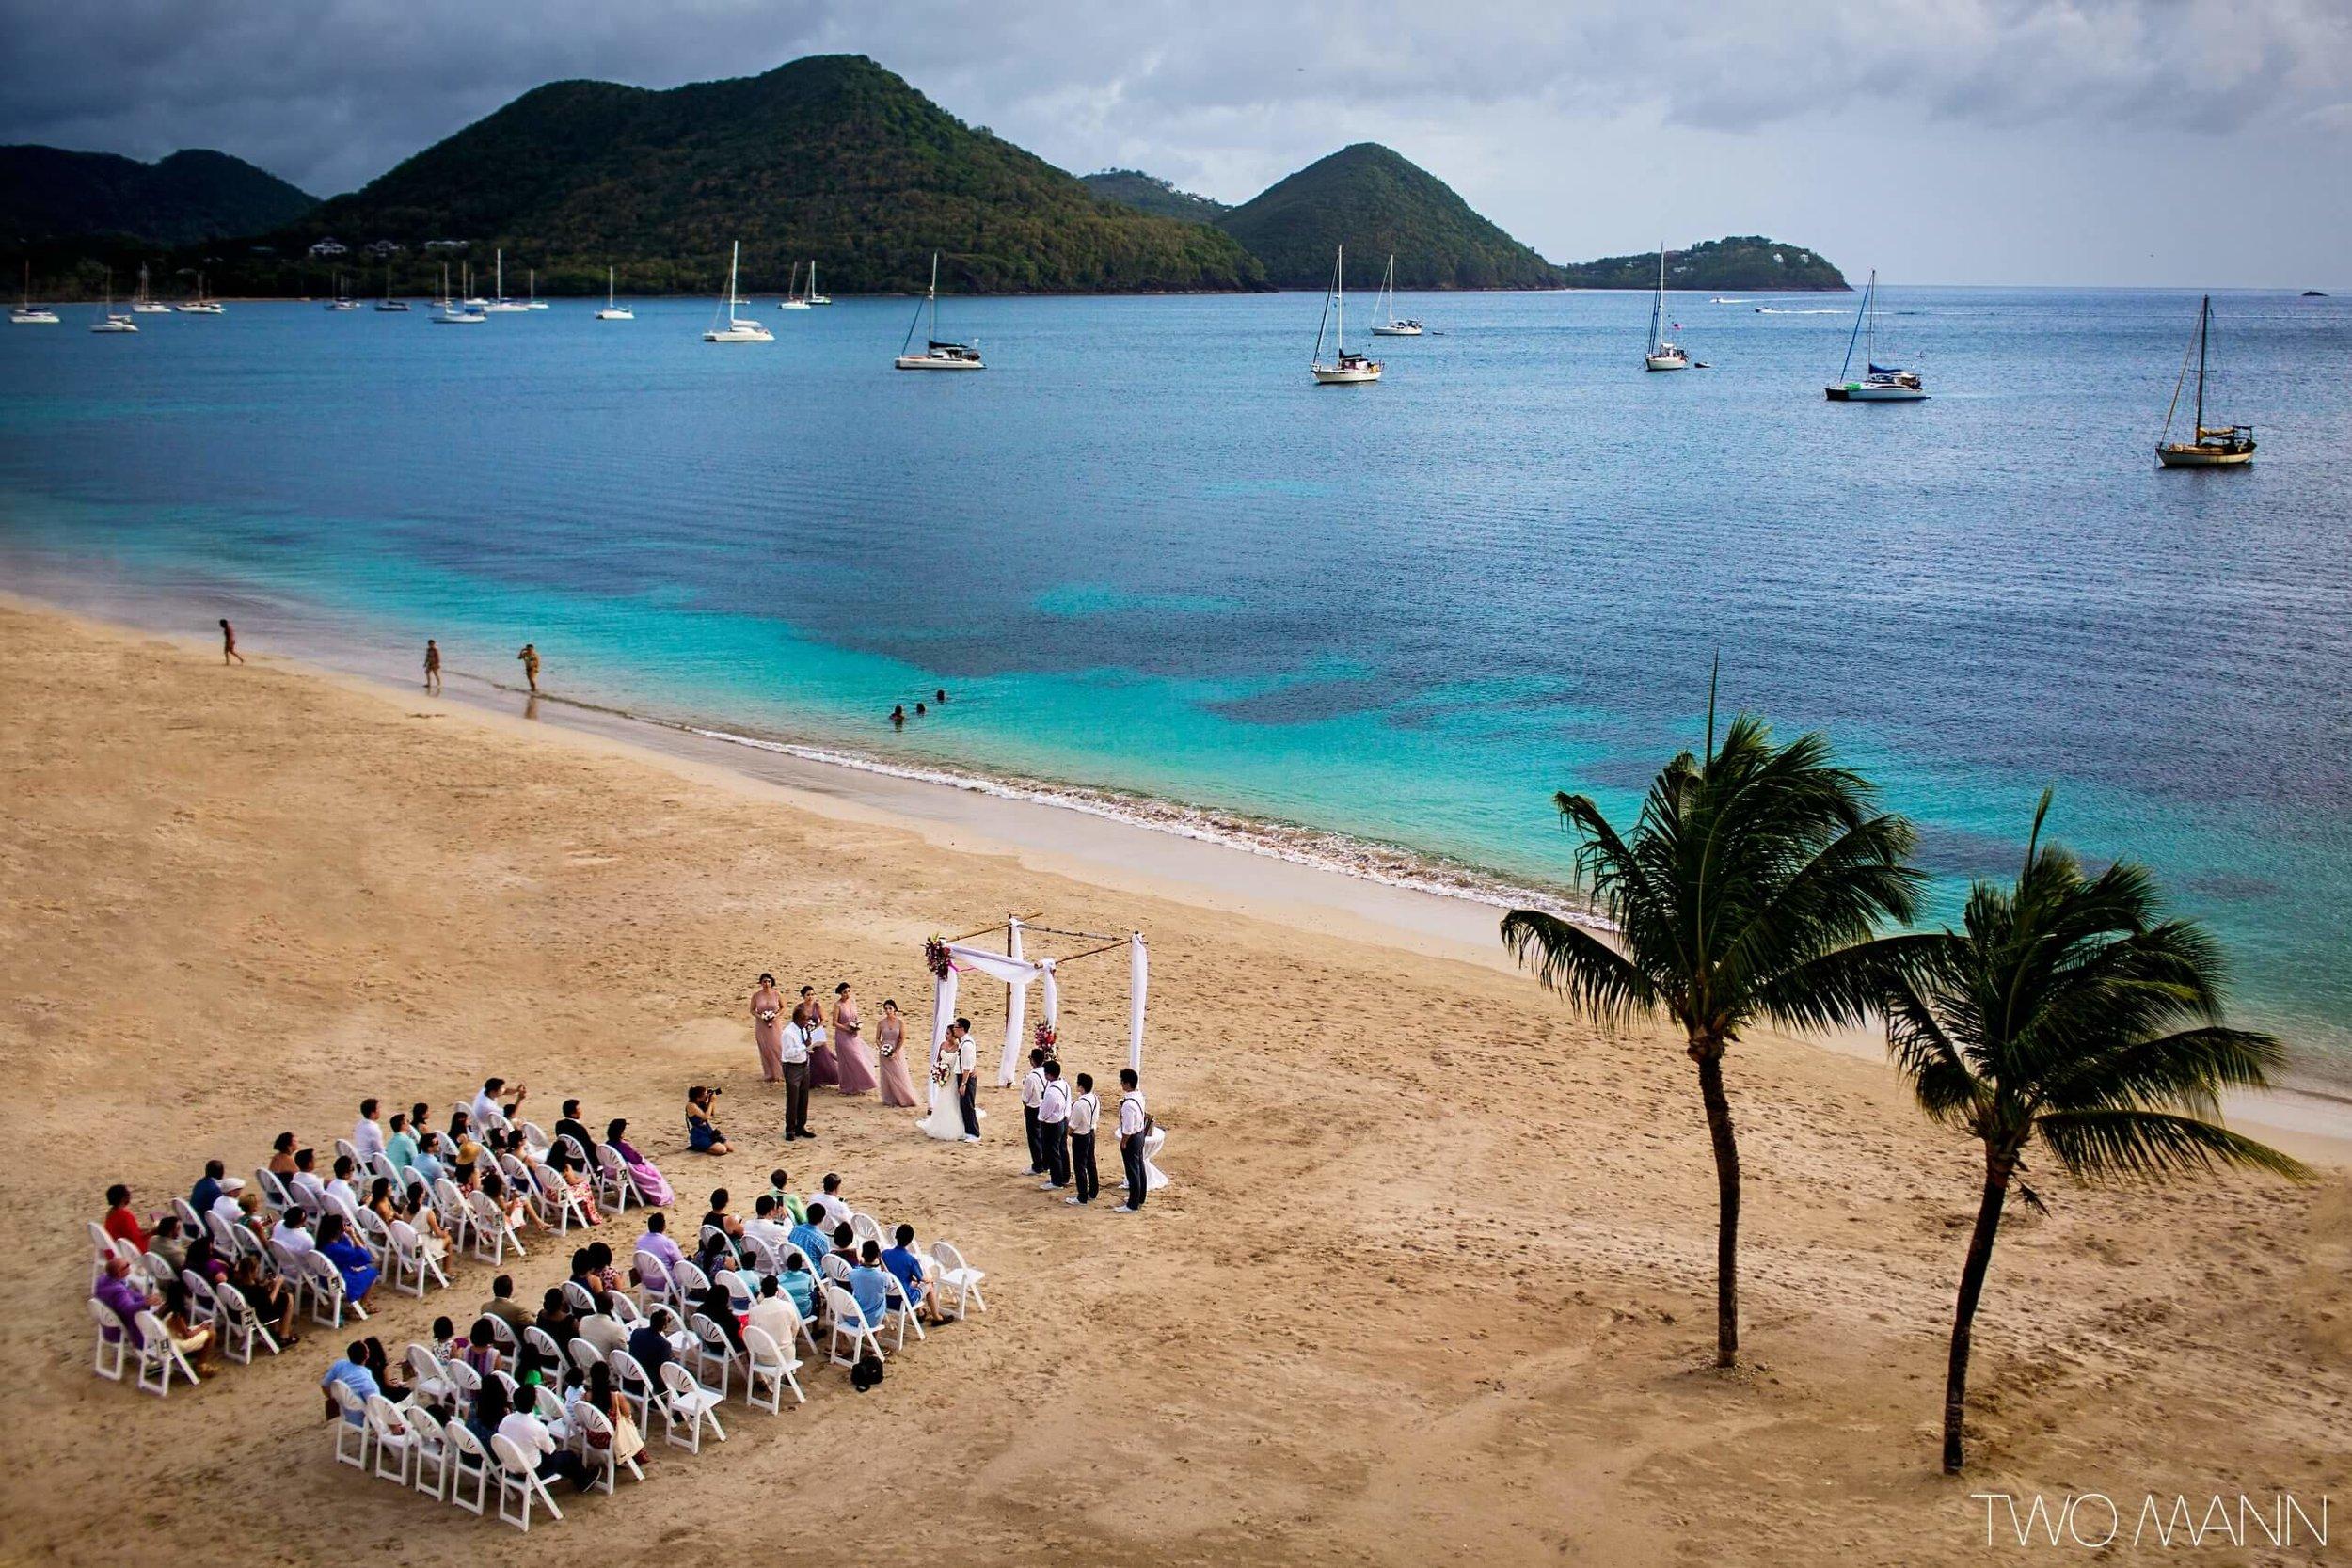 Two-Mann-Studios-Worlds-Best-Wedding-Photography-Best-of-2016-020-2560x1707.jpg